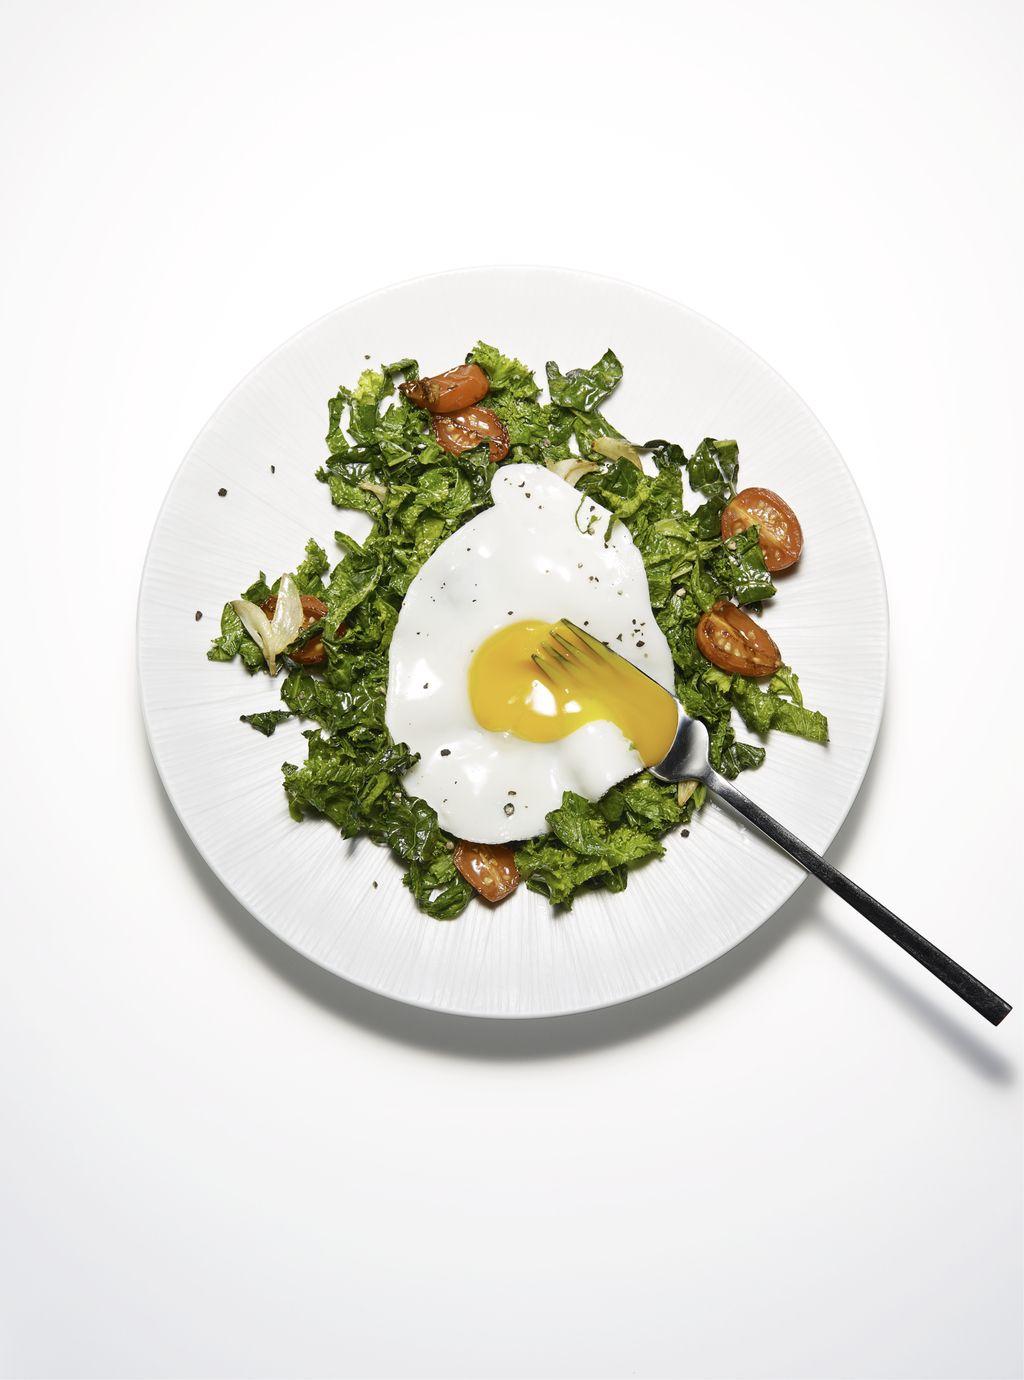 Sunny-Side-Up Eggs on Garlicky Greens